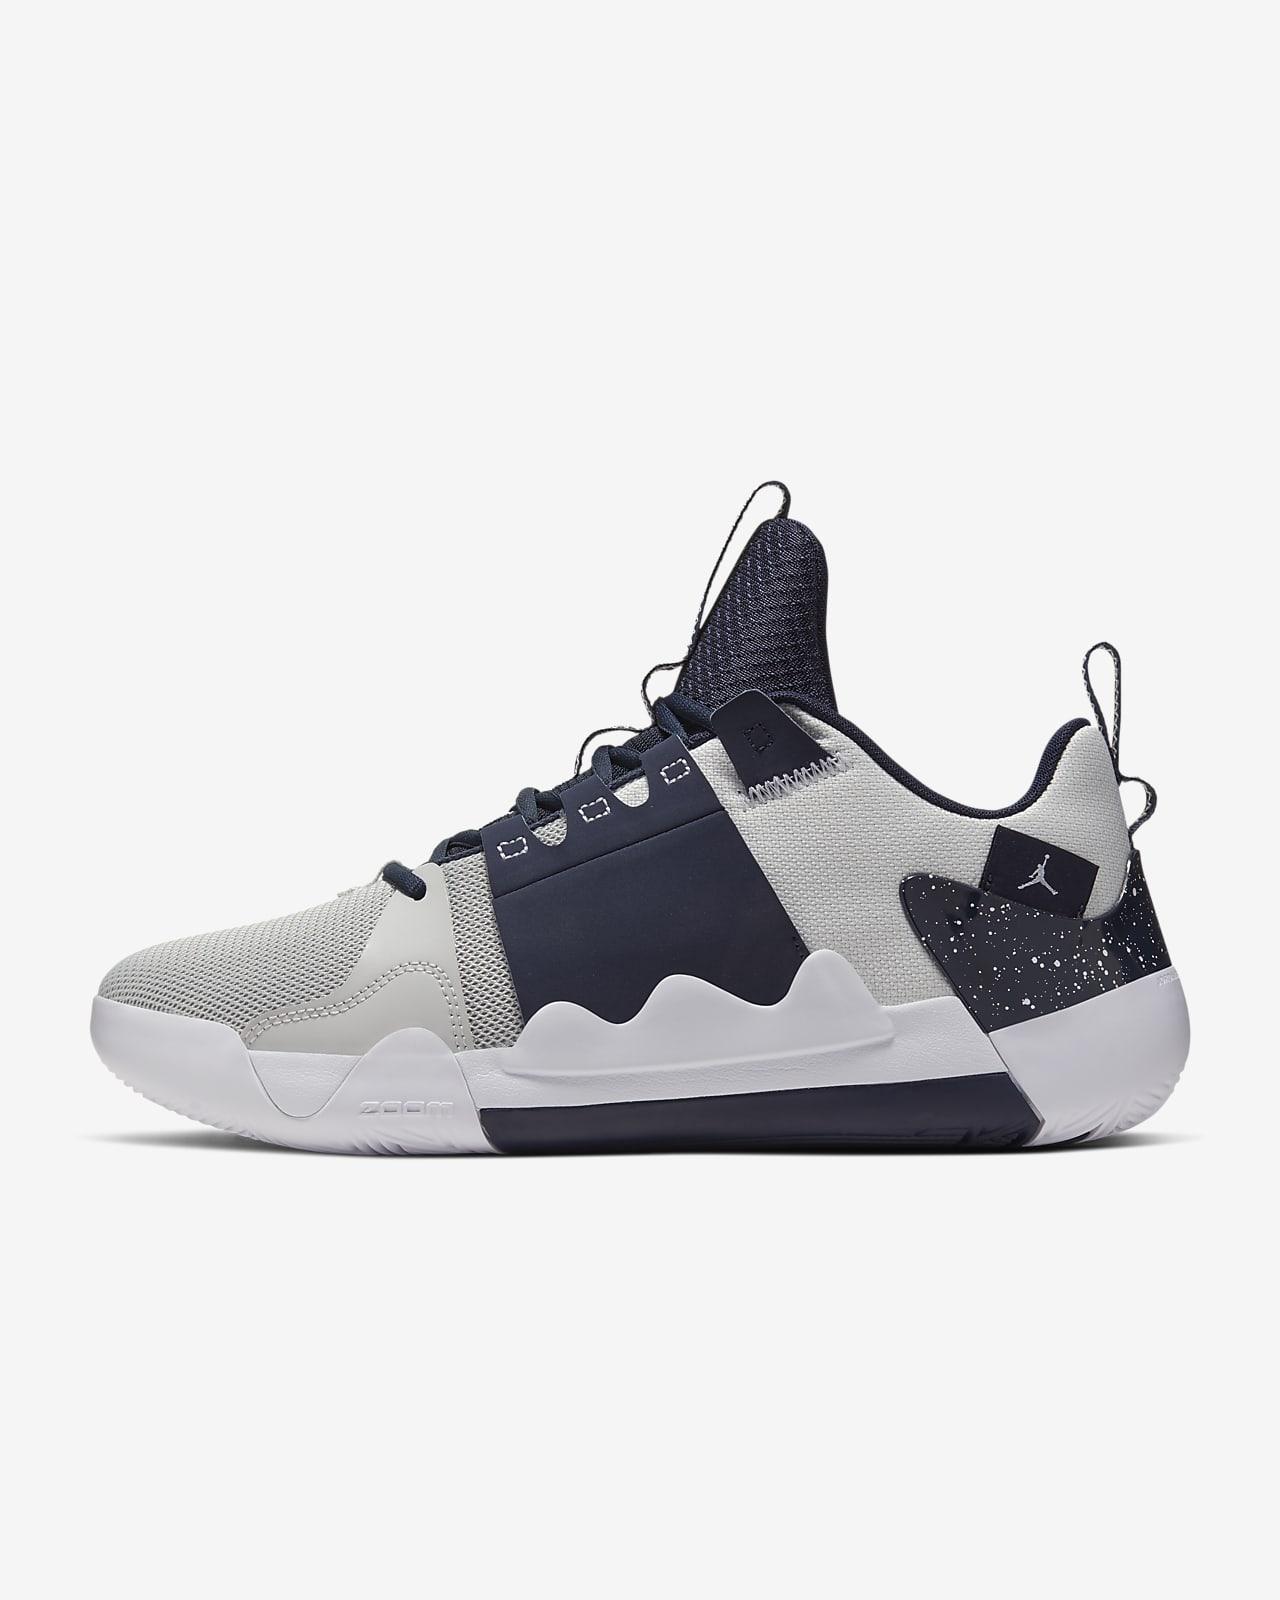 Jordan Zoom Zero Gravity PF 男子篮球鞋